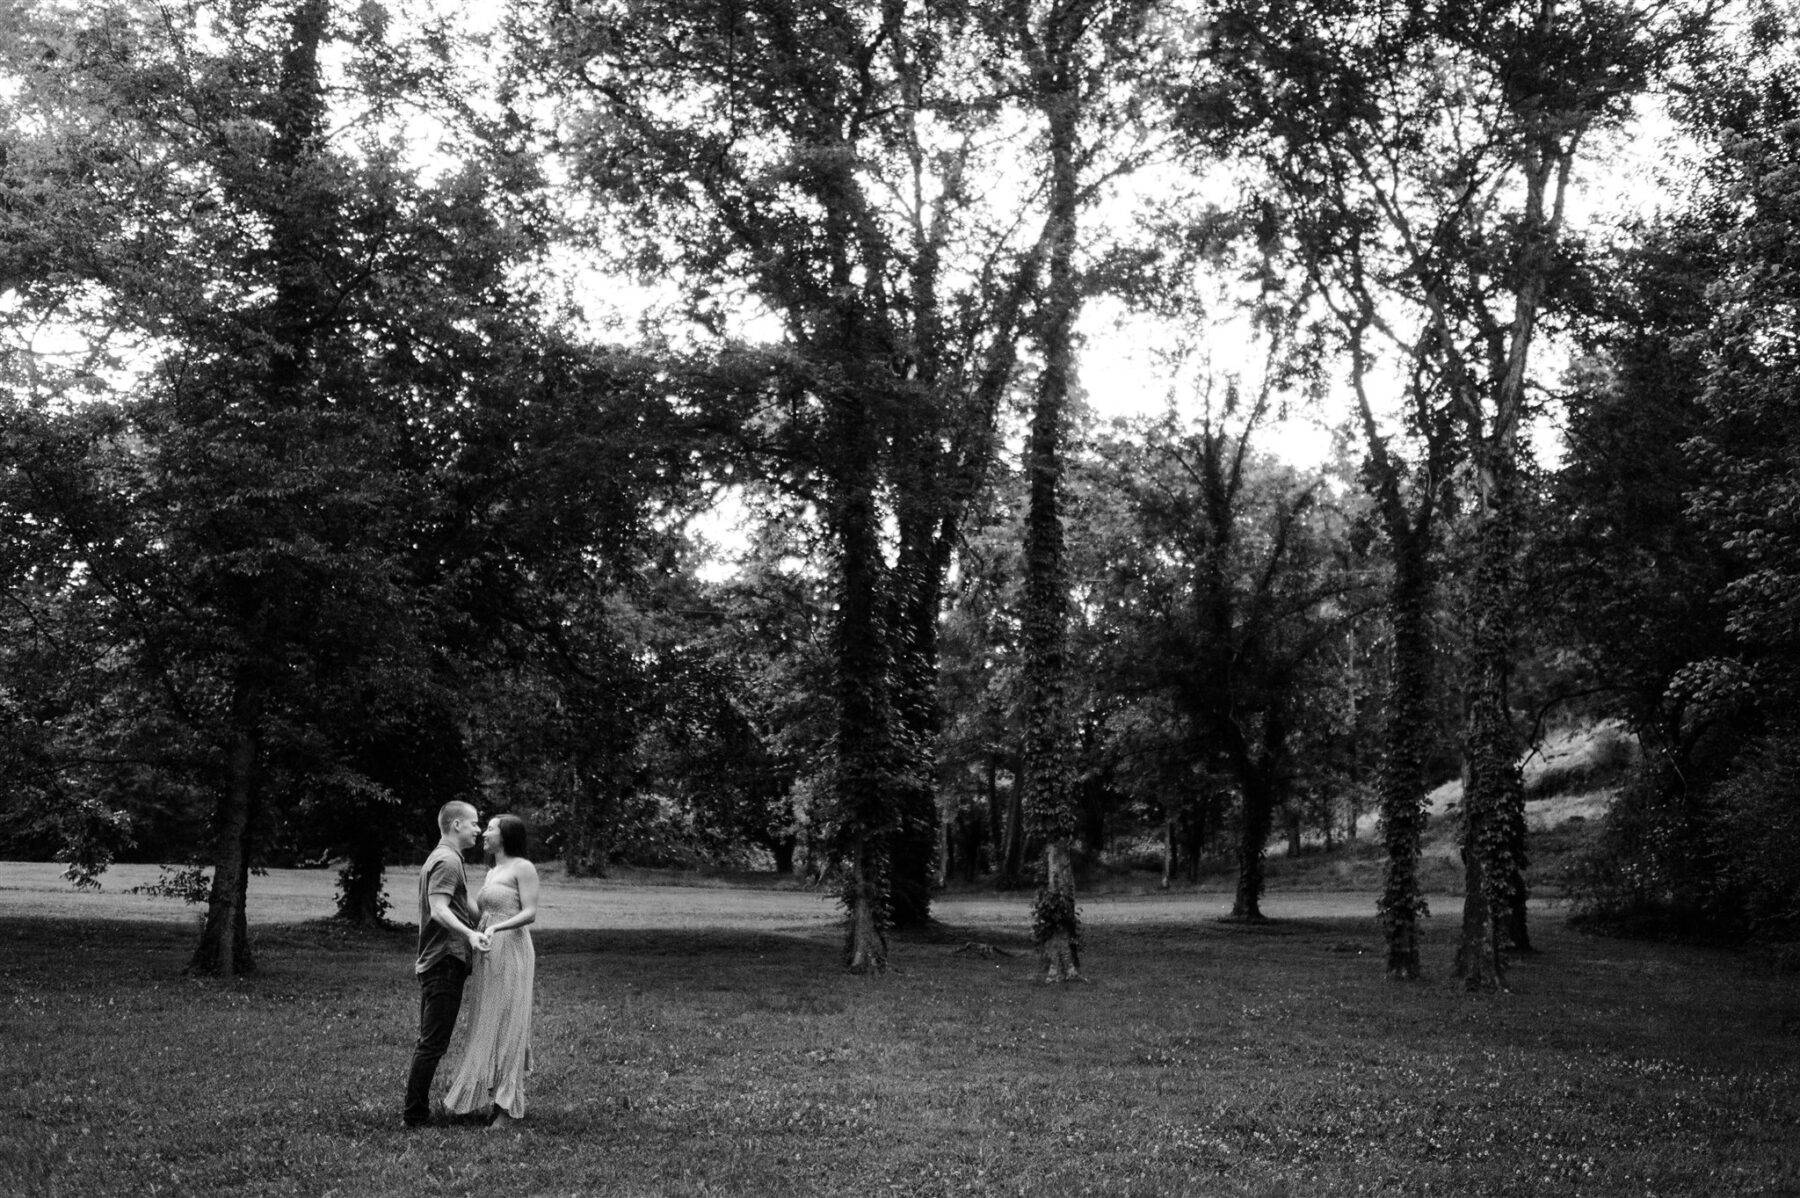 Downtown Franklin Engagement Session | Sara Bill Photography | Nashville Bride Guide